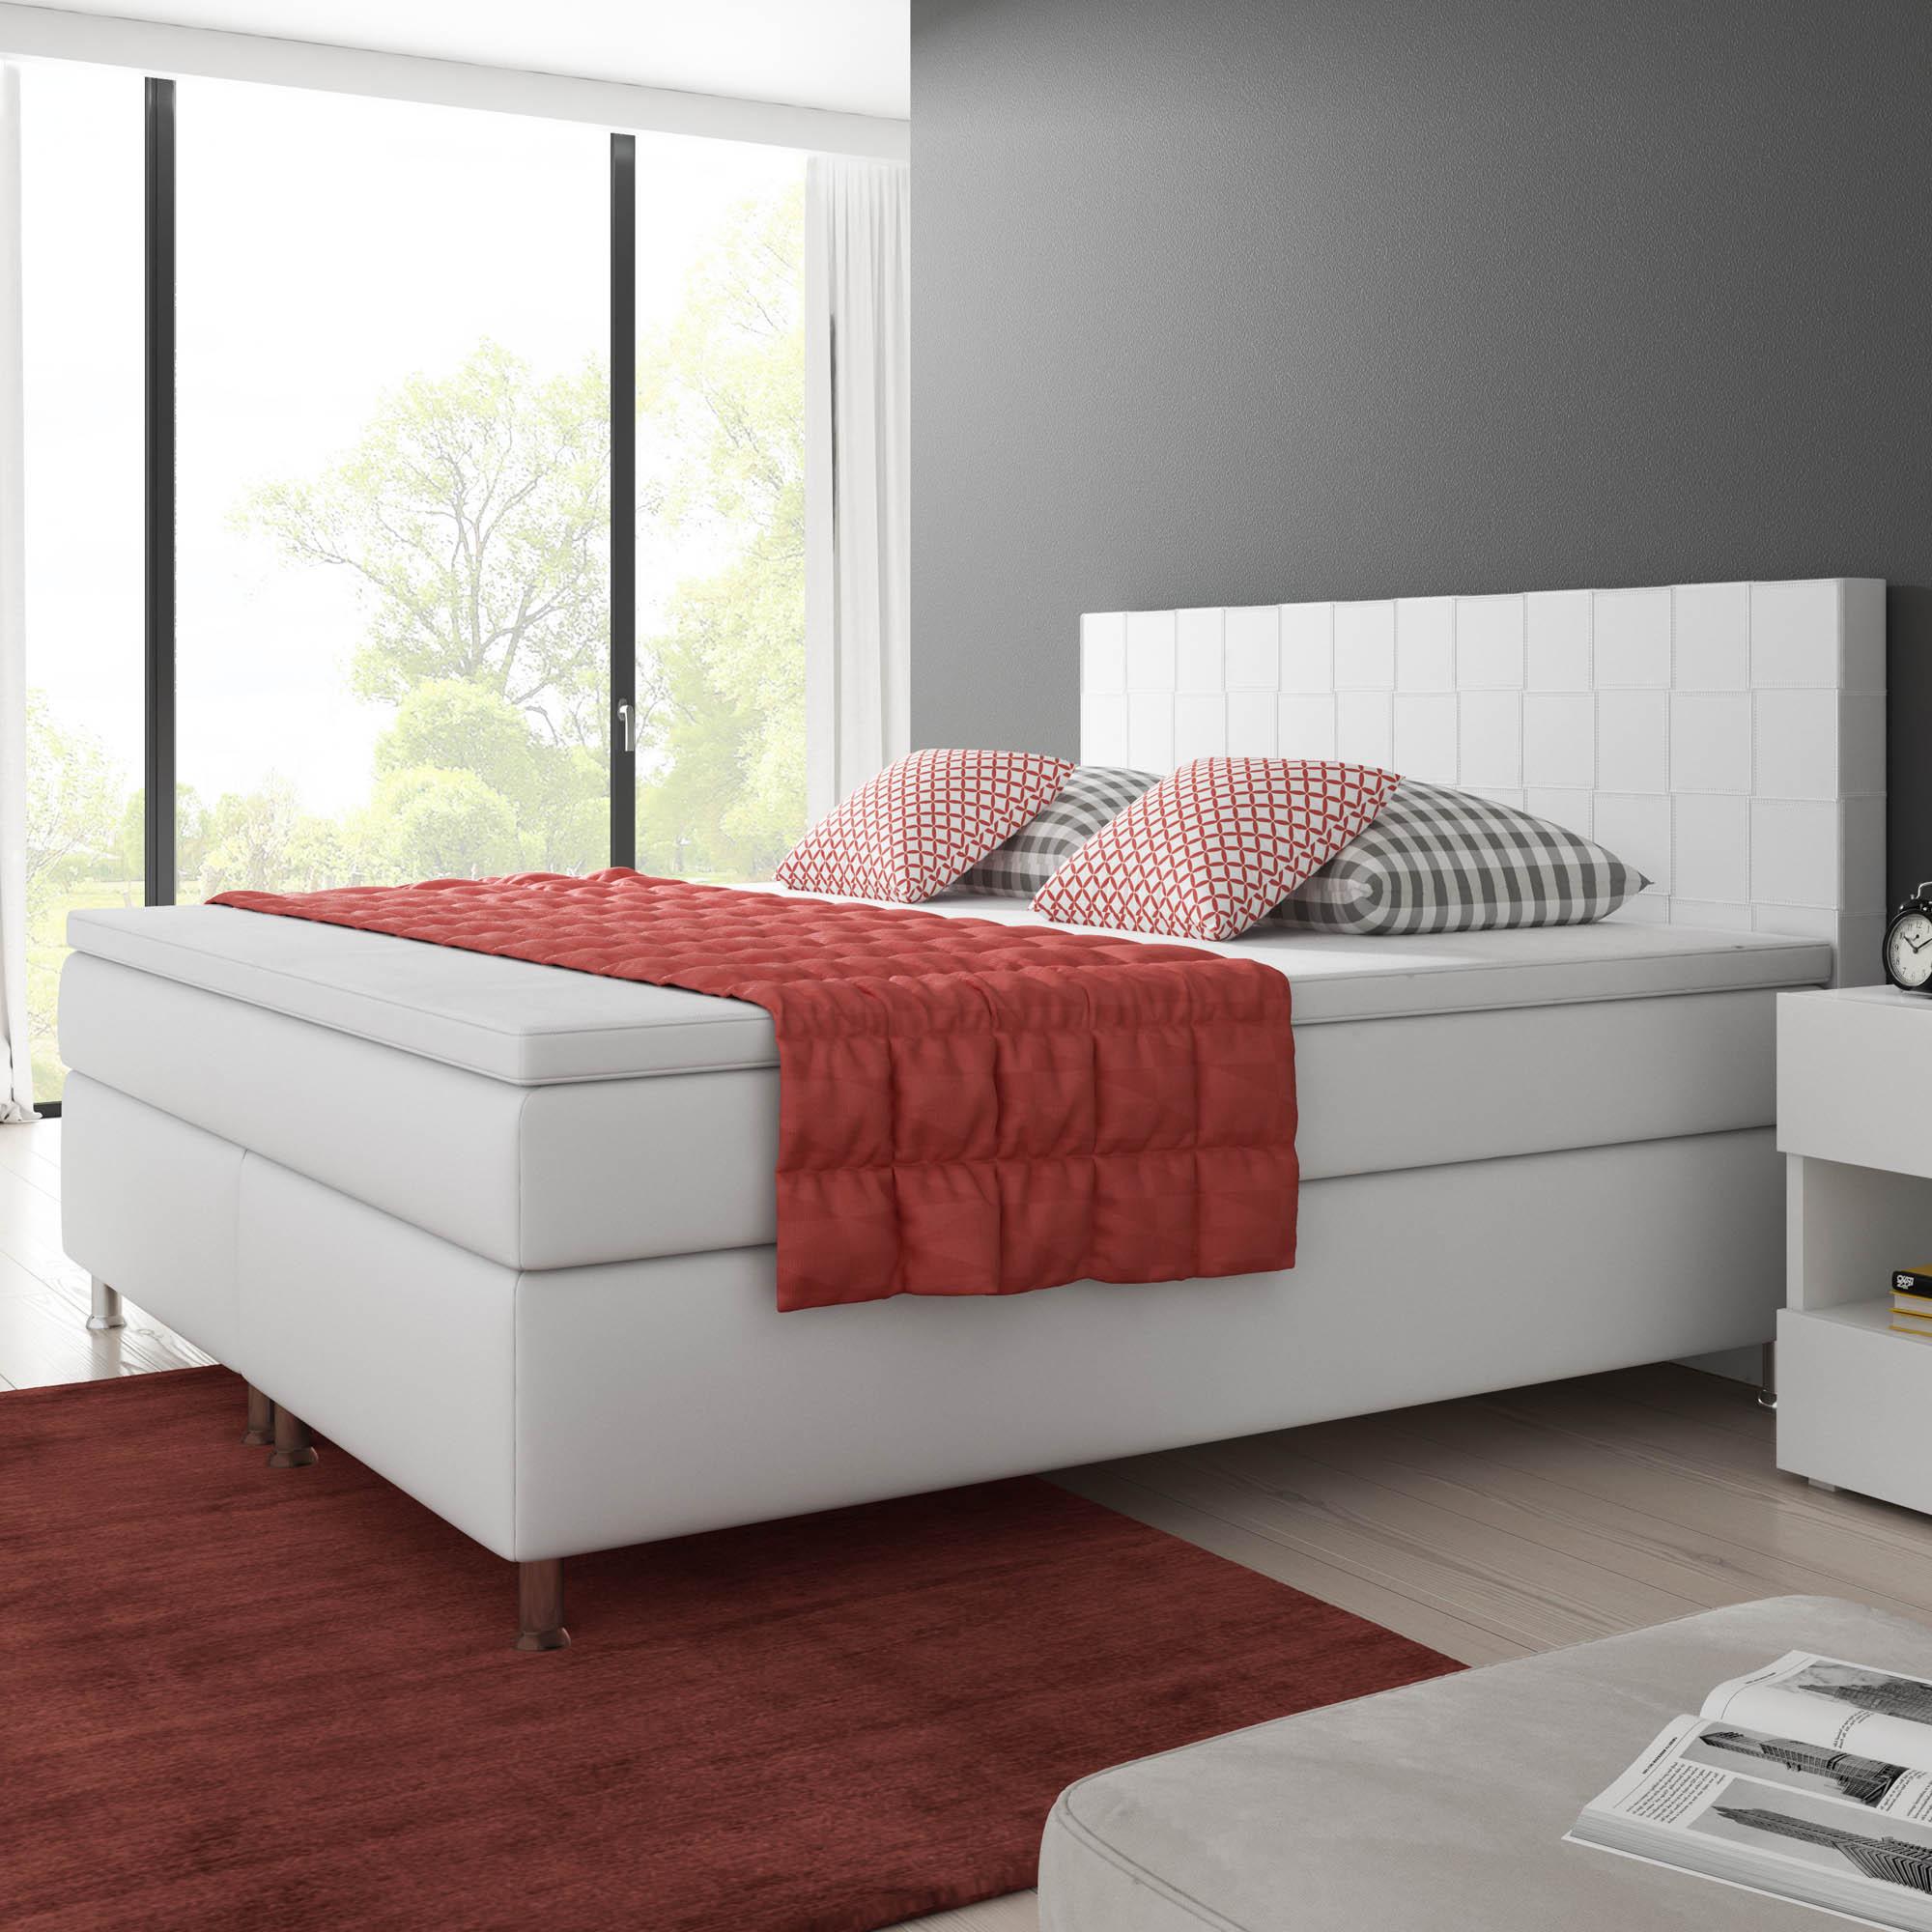 boxspringbett ancona 180x200 cm kunstleder wei schlafen. Black Bedroom Furniture Sets. Home Design Ideas